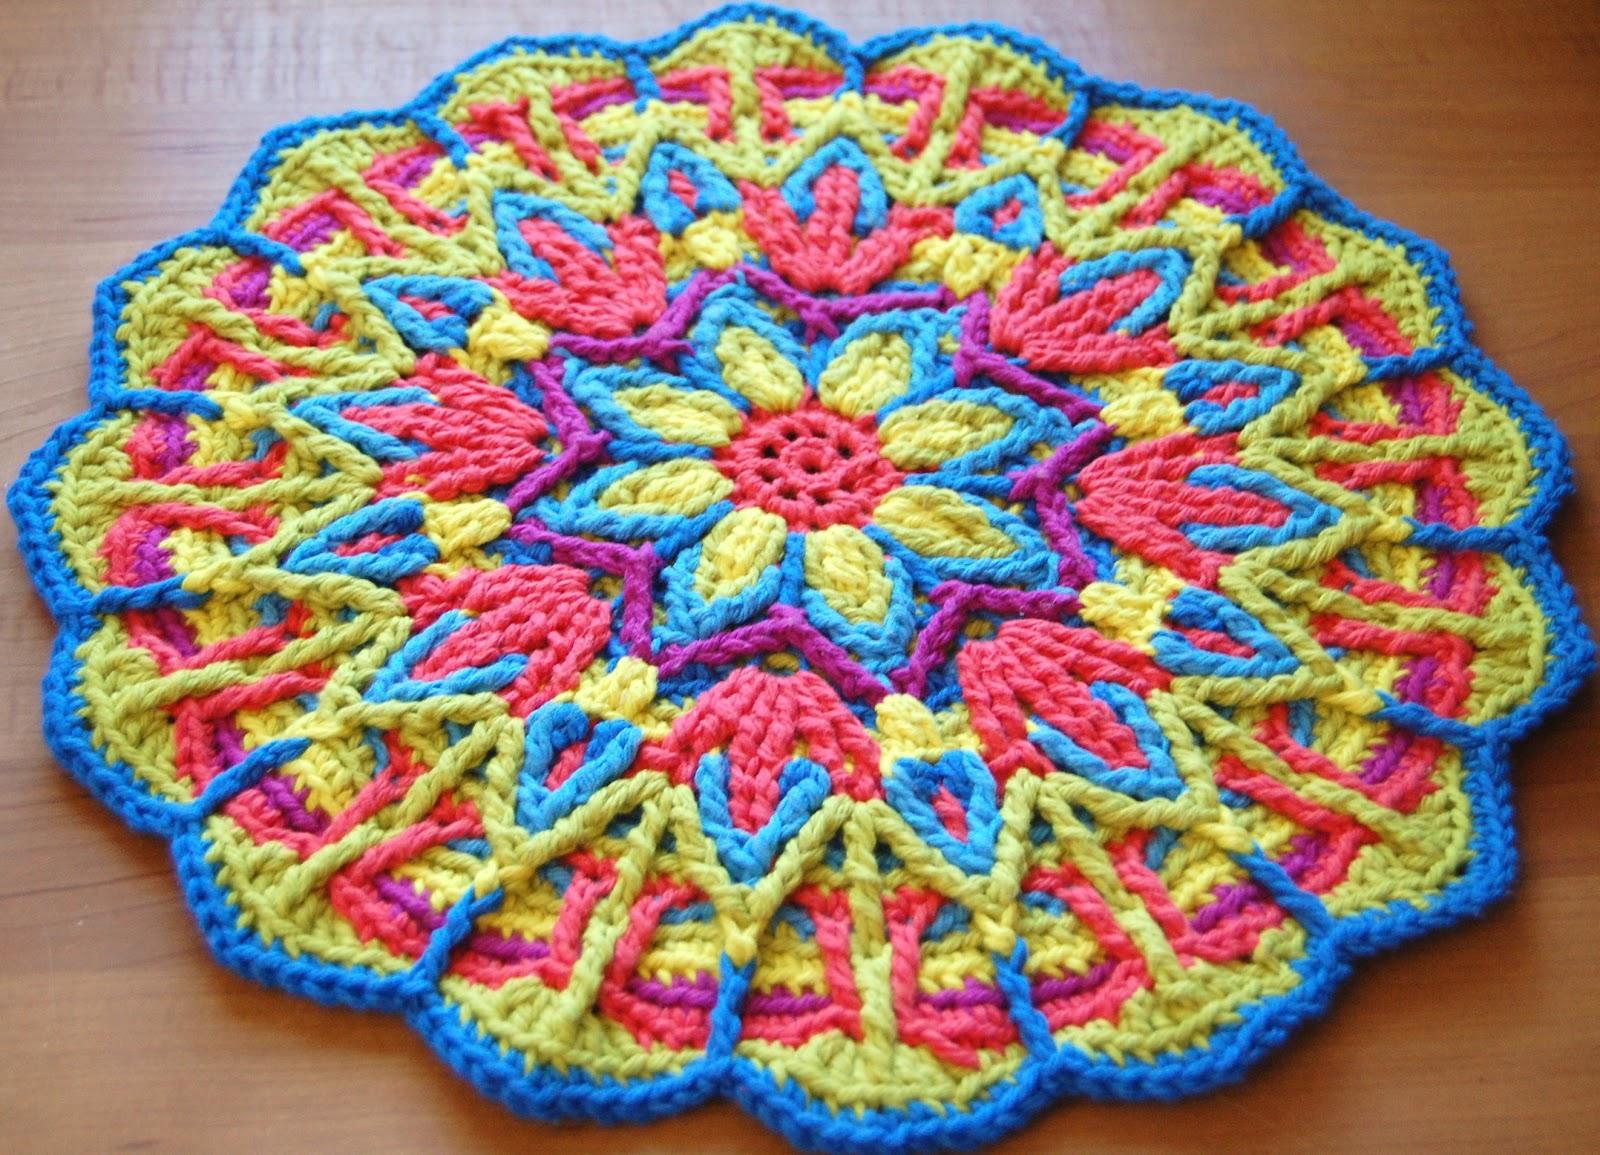 Crochet Patterns Mandala : Overlay Crochet Mandala CAL - Petals to Picots